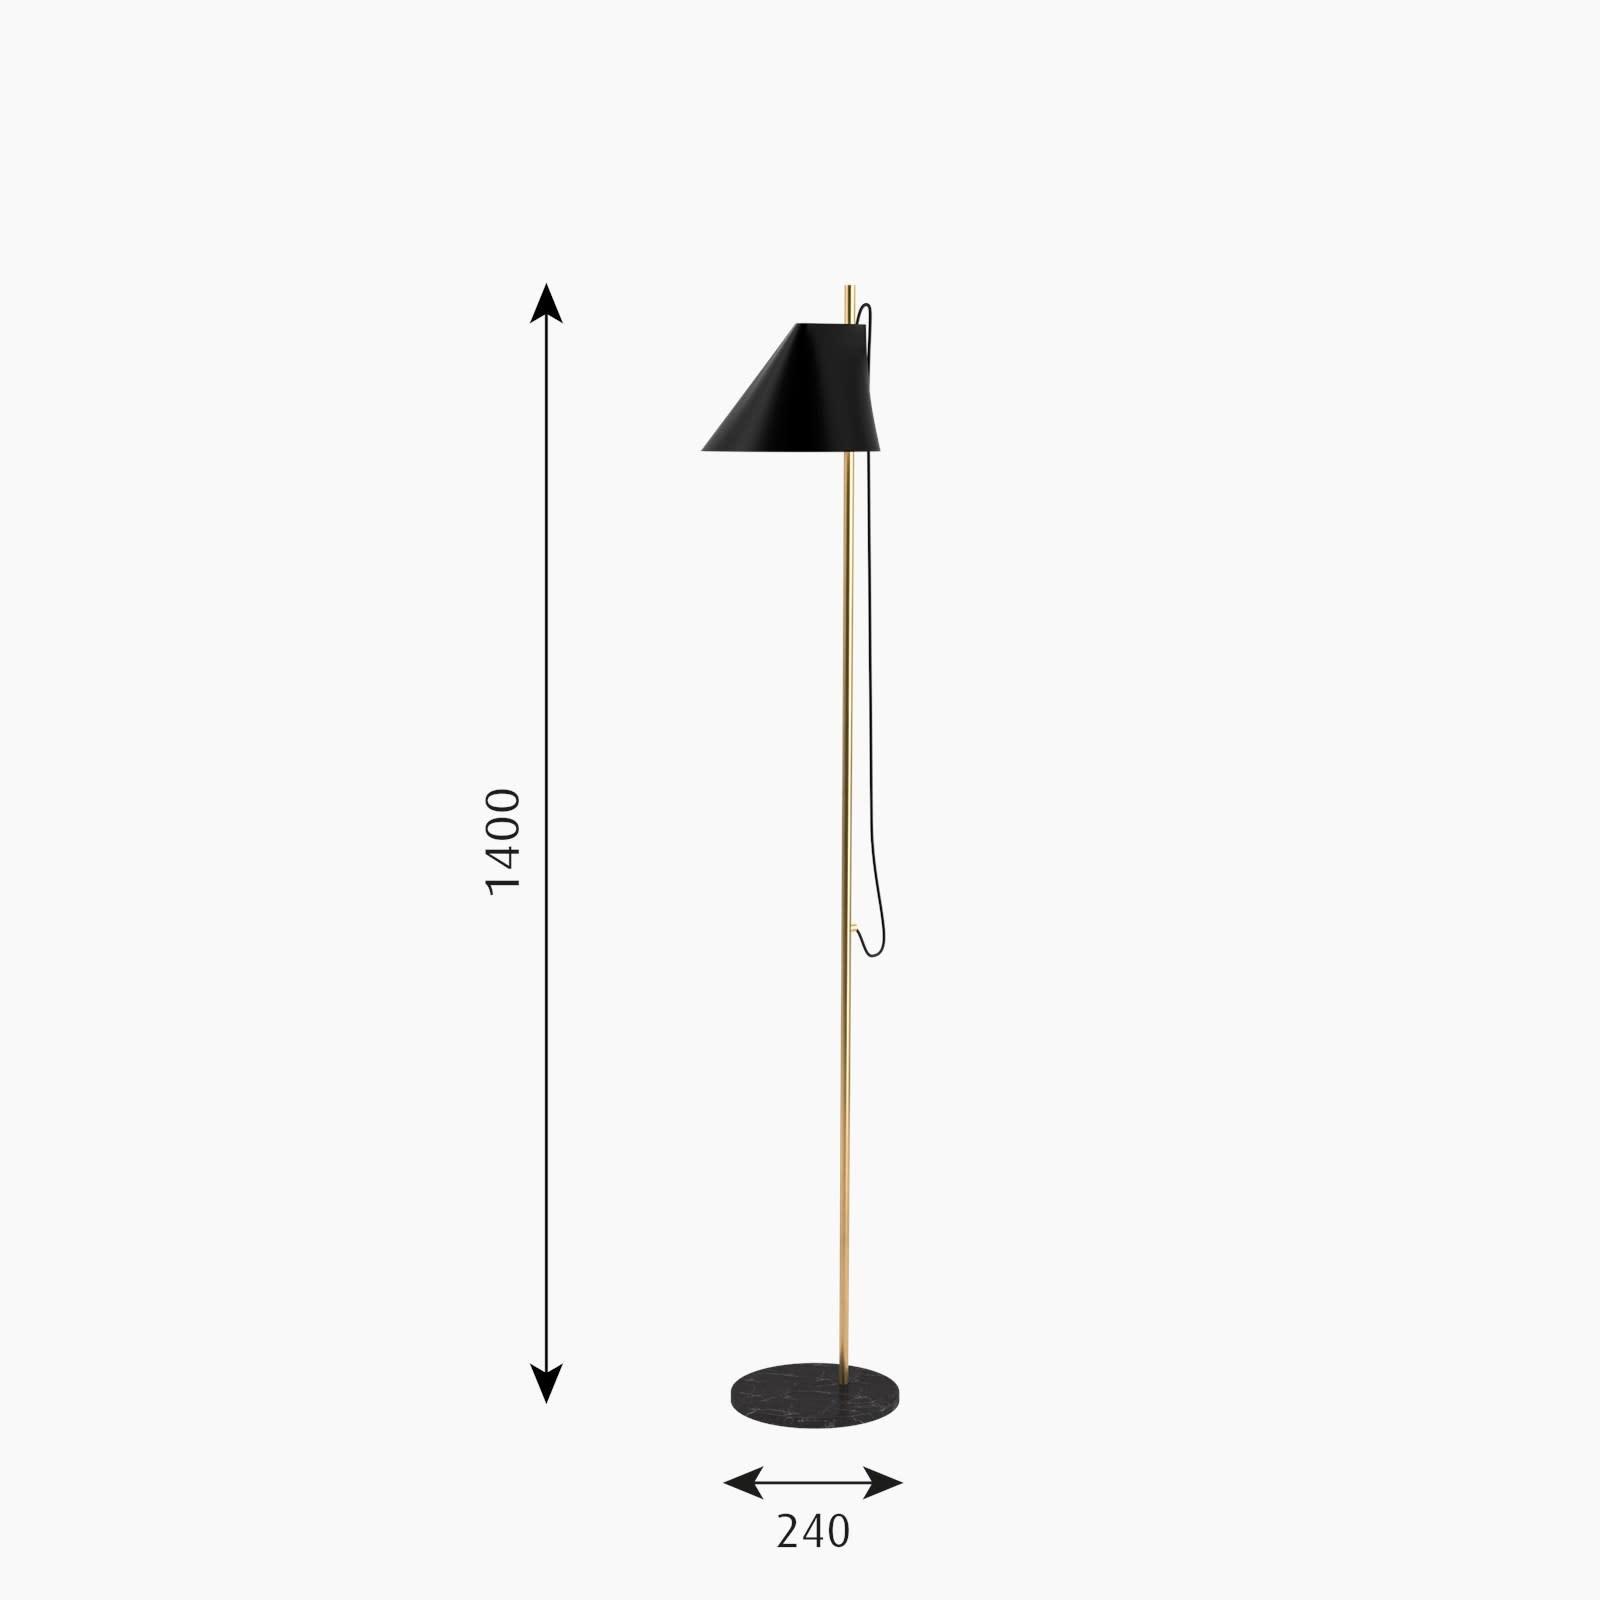 louis-poulsen-yuh-lamp-dimensions